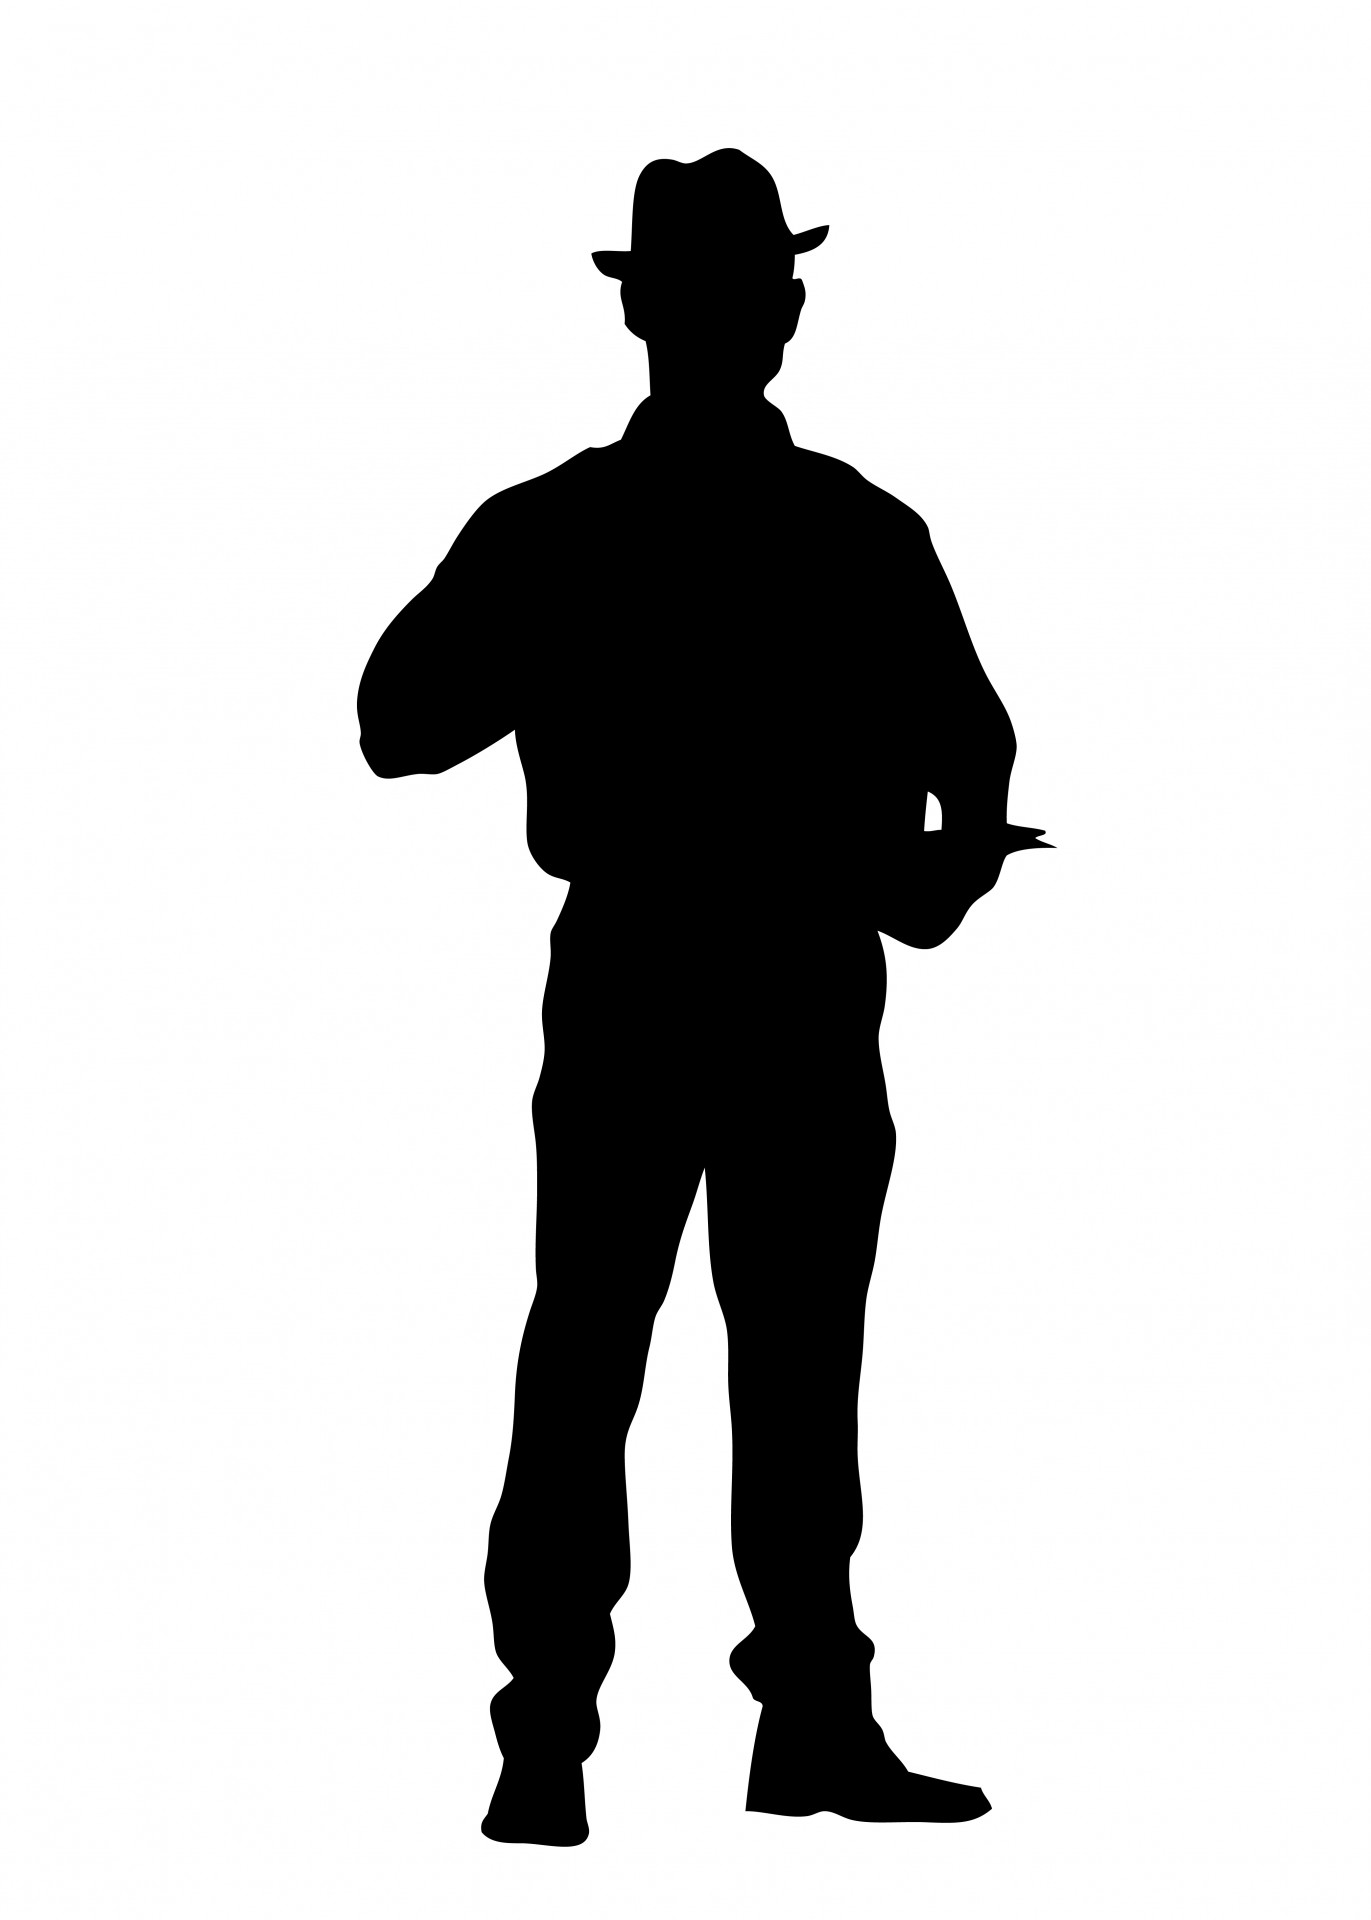 1371x1920 Man Standing Silhouette Free Stock Photo